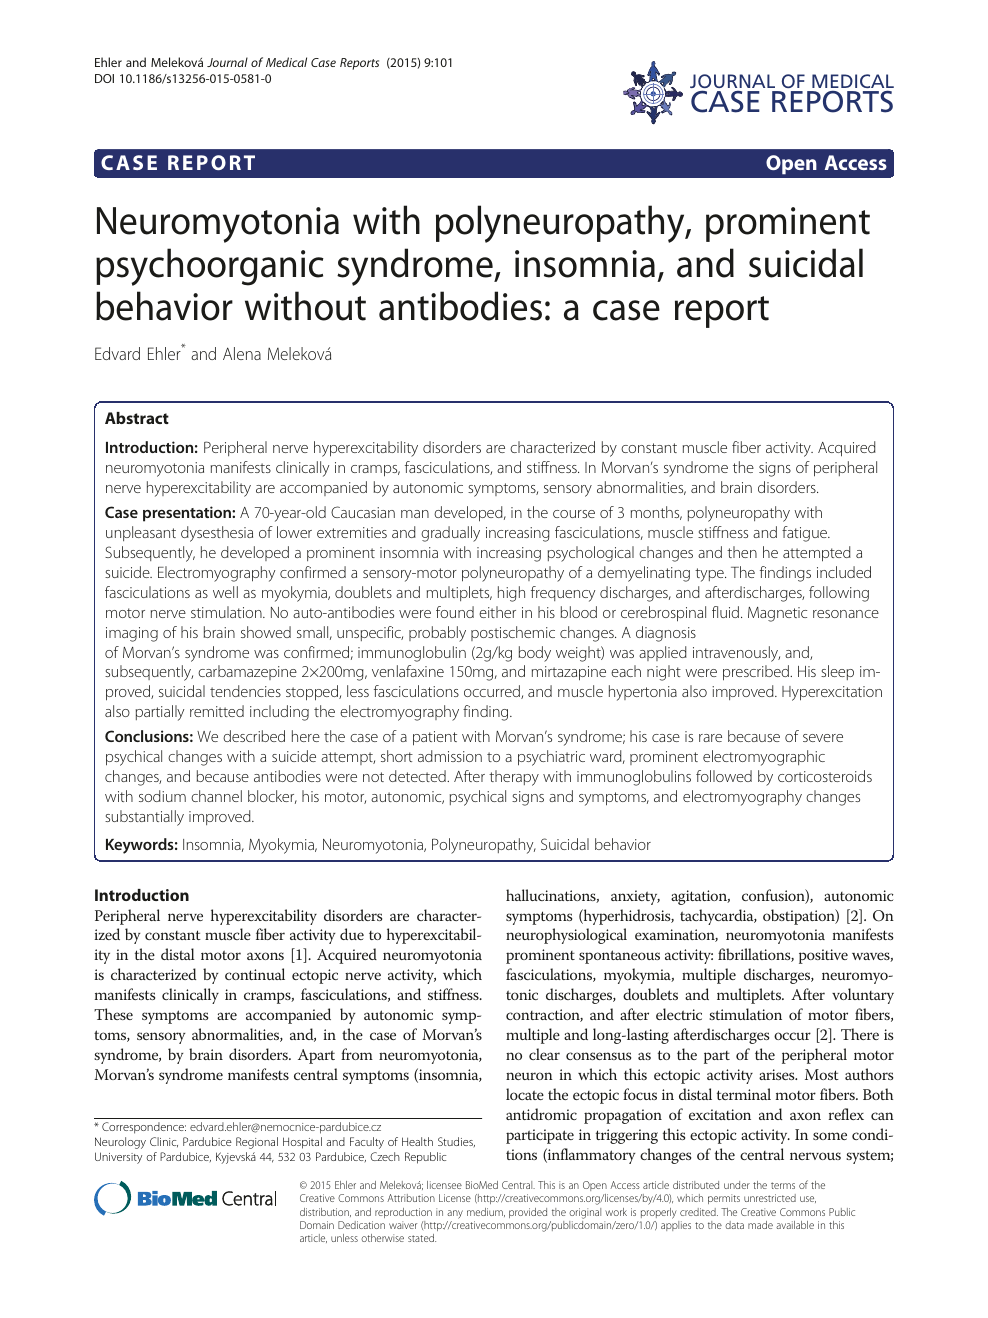 Neuromyotonia with polyneuropathy, prominent psychoorganic